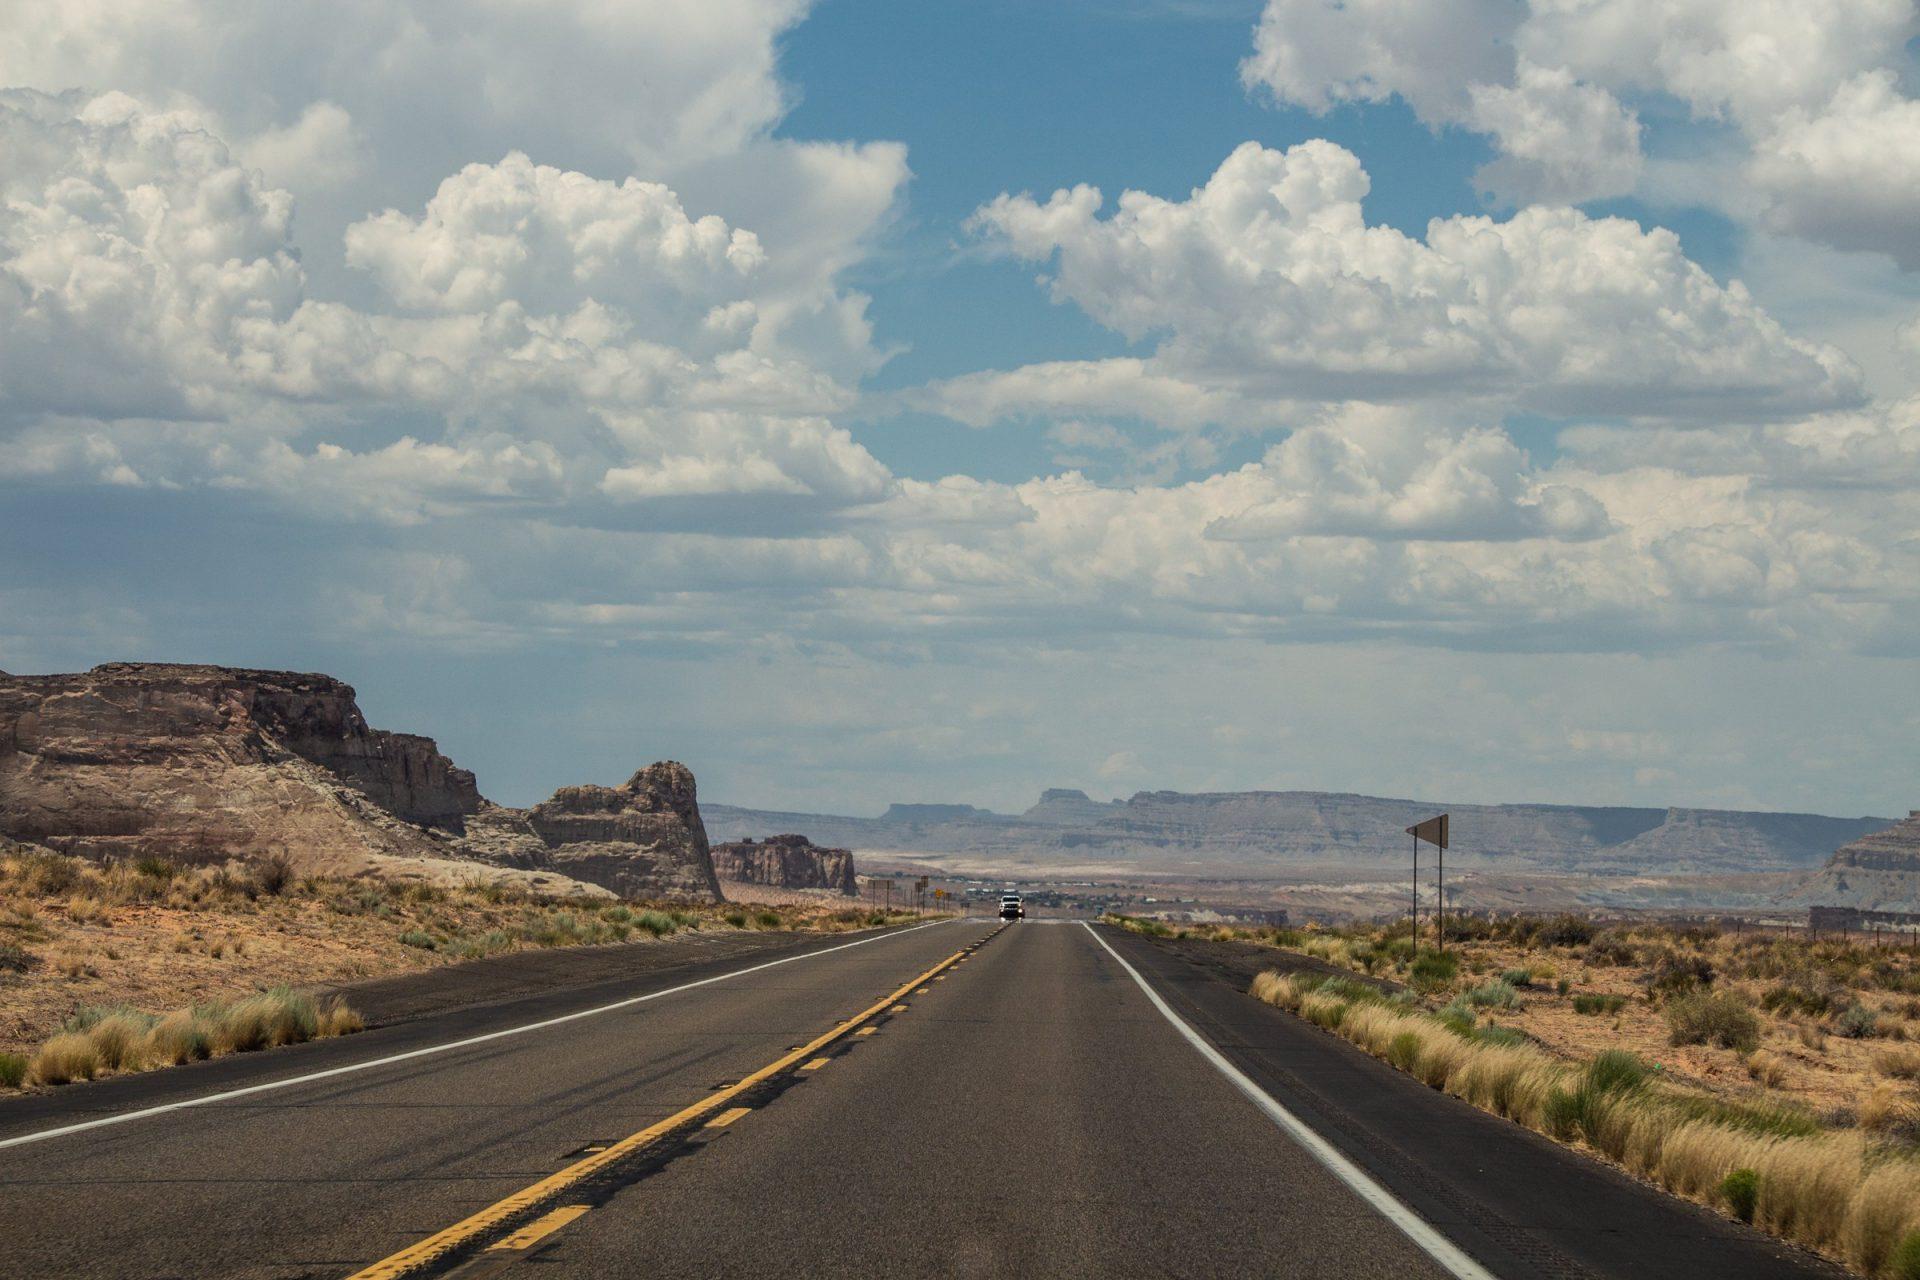 Highway In Desert Near Mountains